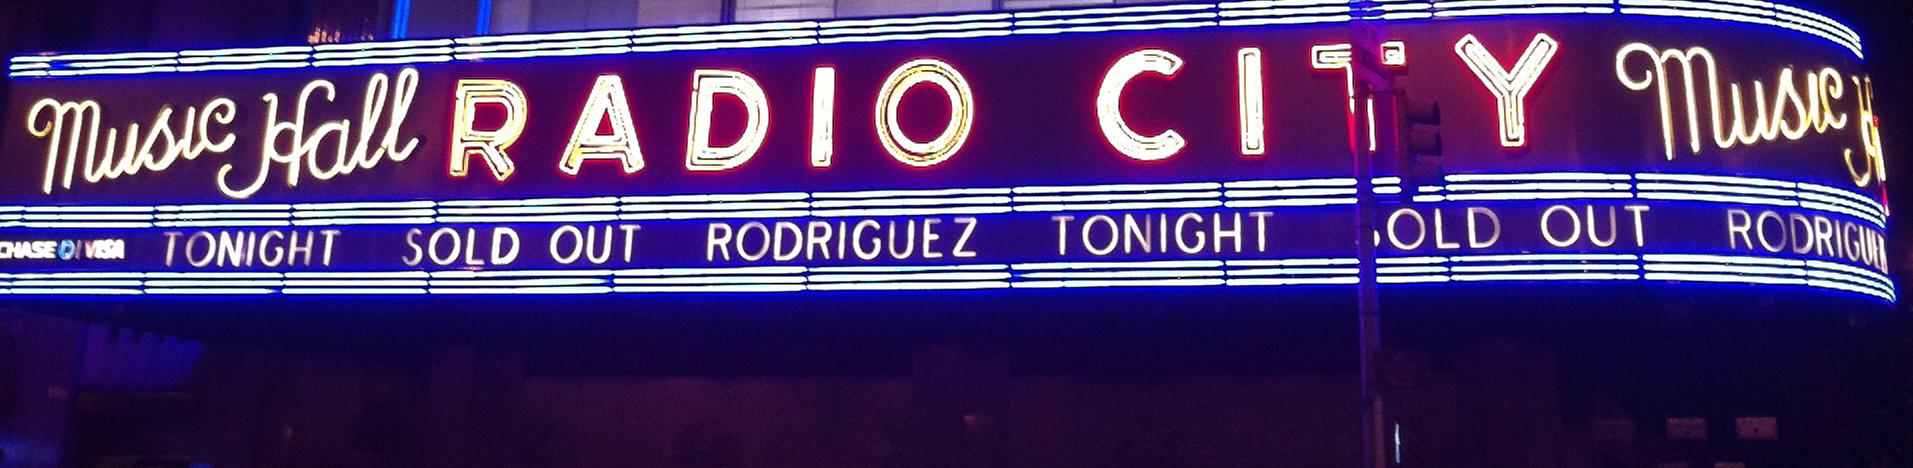 2013-10-11-Rodriguez.jpg